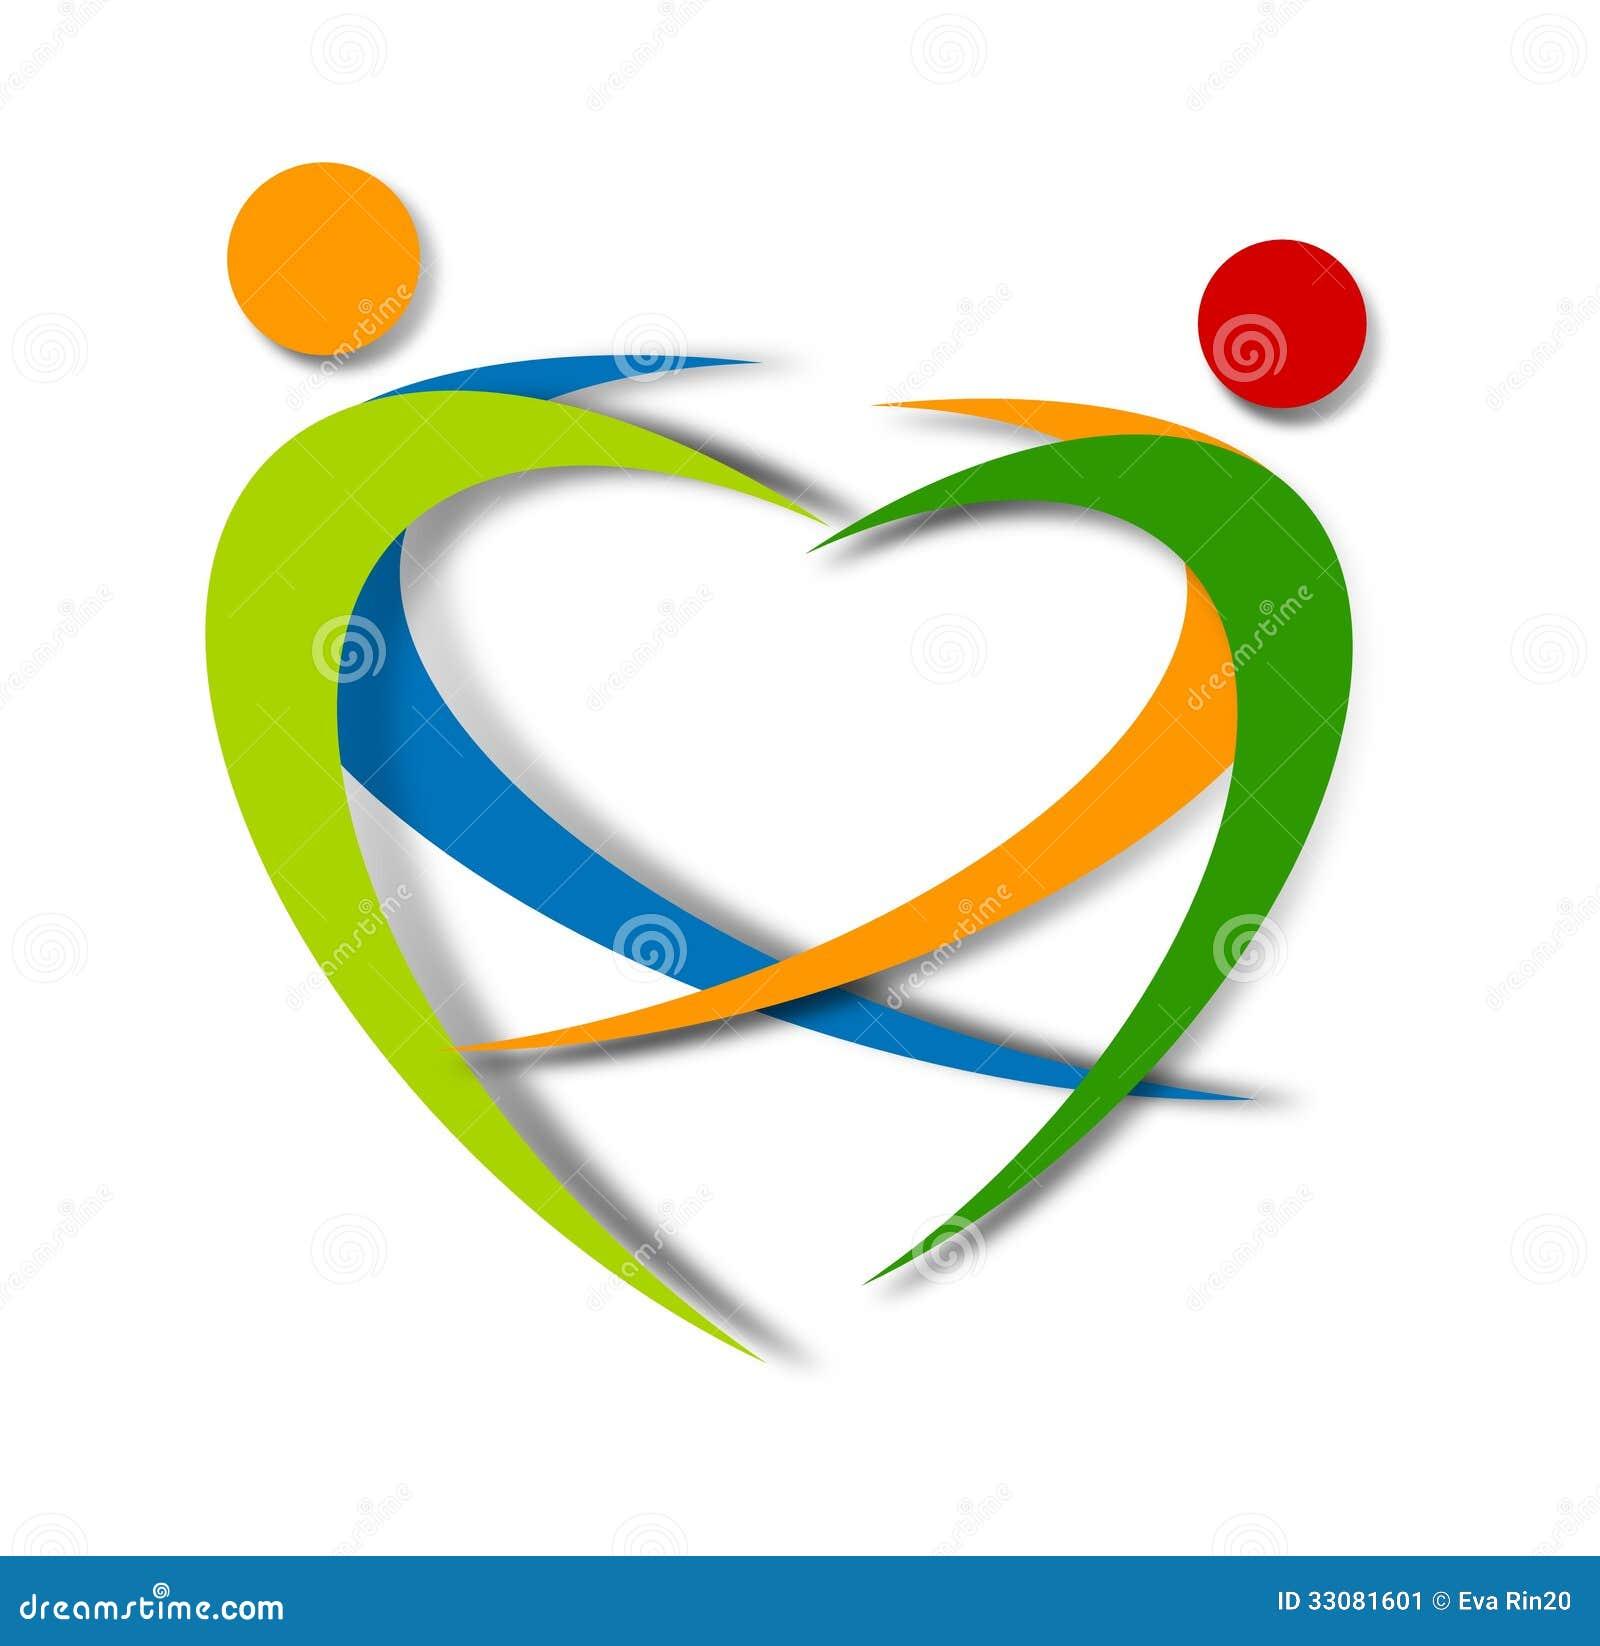 Wellness Abstract Logo Design Stock Image - Image: 33081601